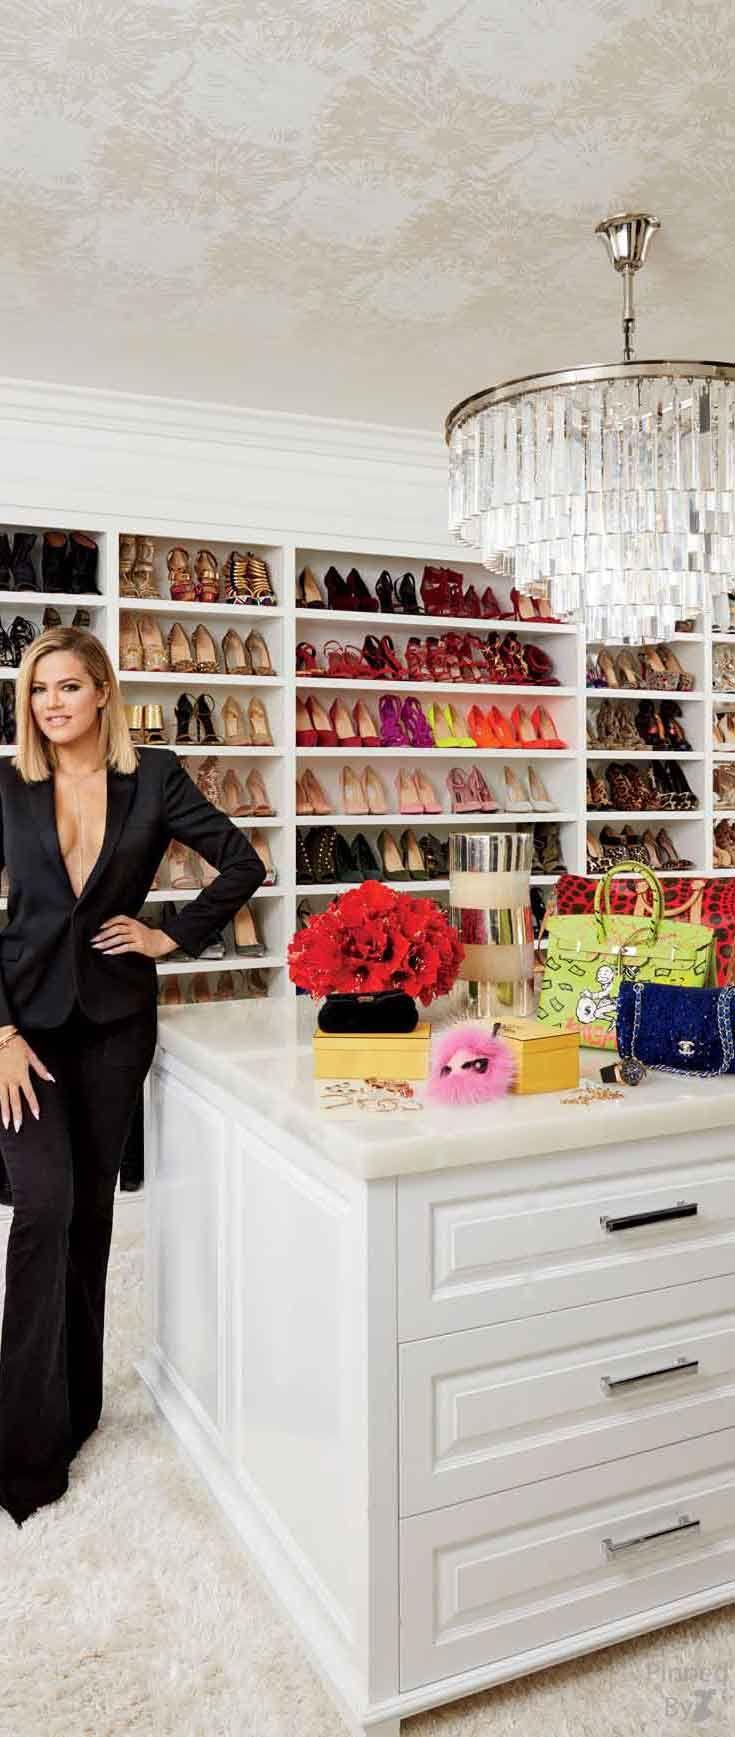 Dressing Room 4 Khloe Kardashian MichaelOXOXO JonXOXOXO EmmaruthXOXO Emmammerrick CLOSETS